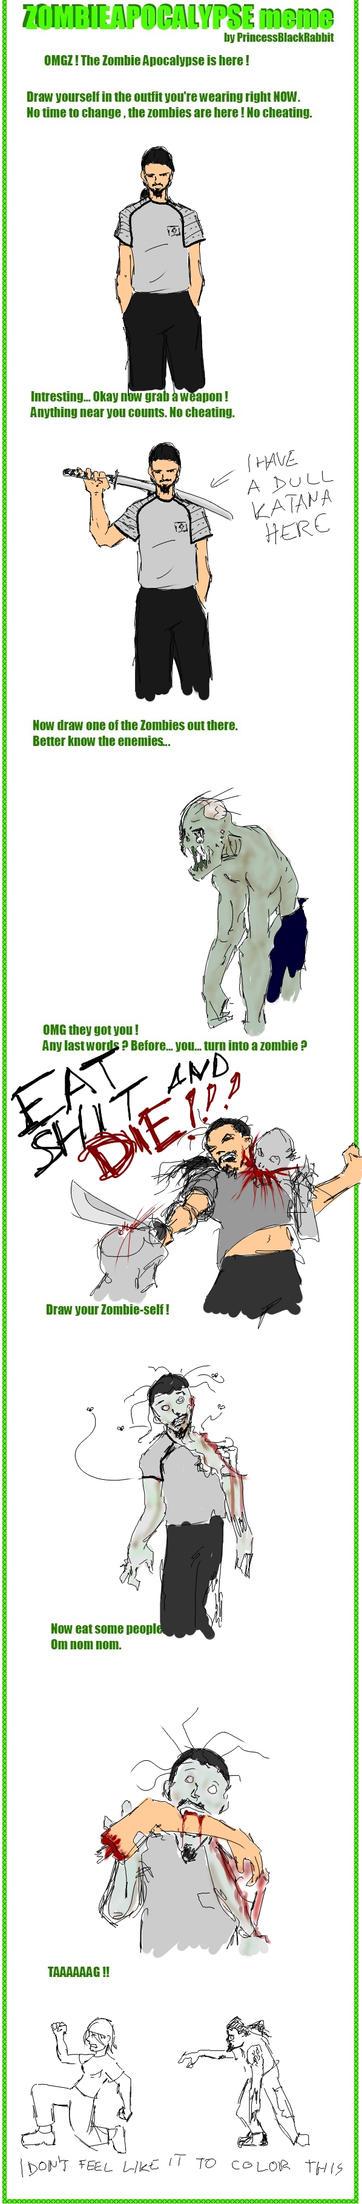 Zombie Apocalypse Meme by sutechshiroi